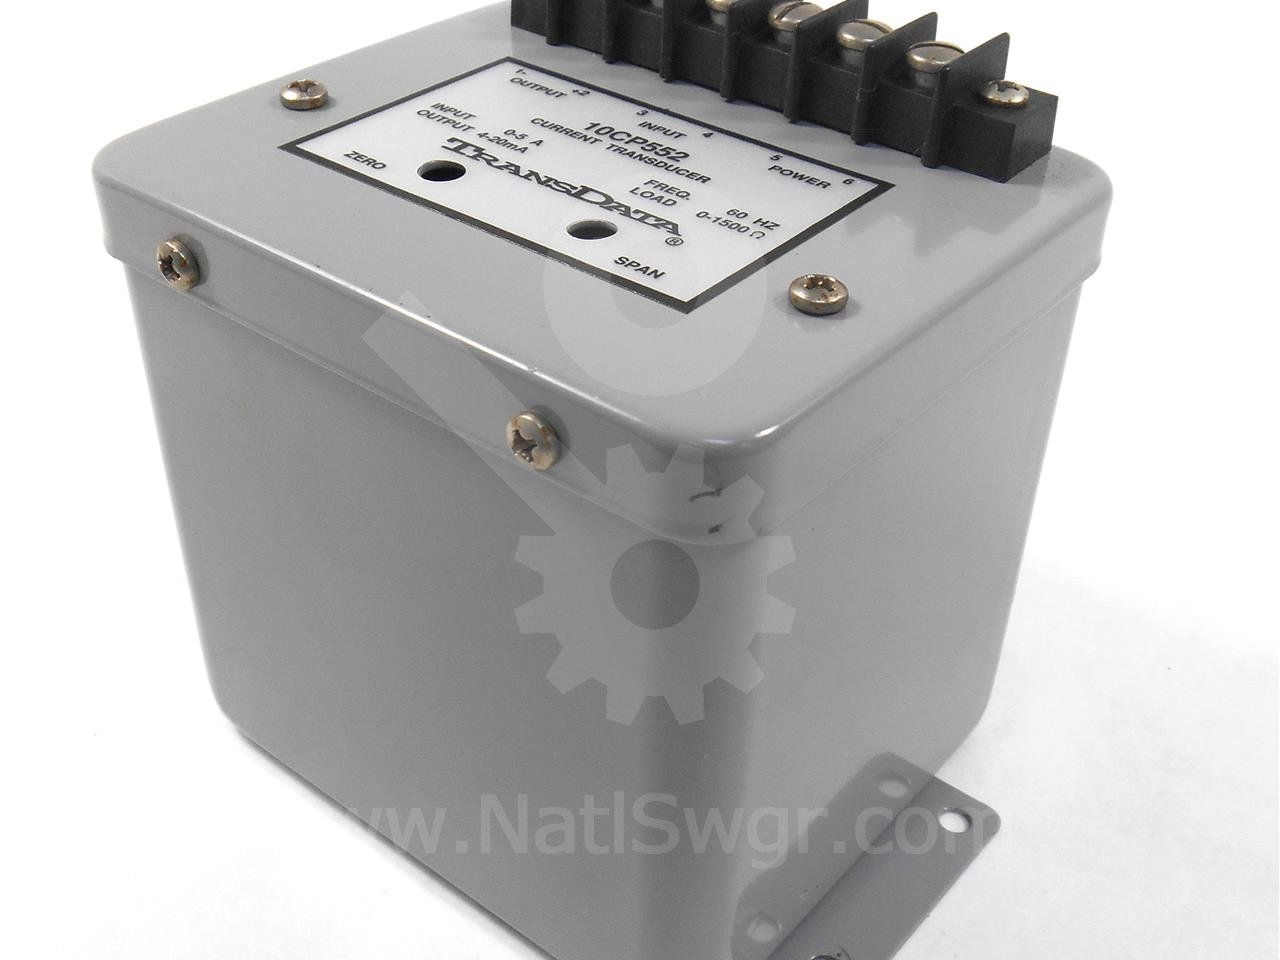 New TransData 10CP552 Current 1 Element 4-20mA Output Transducer 5 Fullscale Calibrating Amps